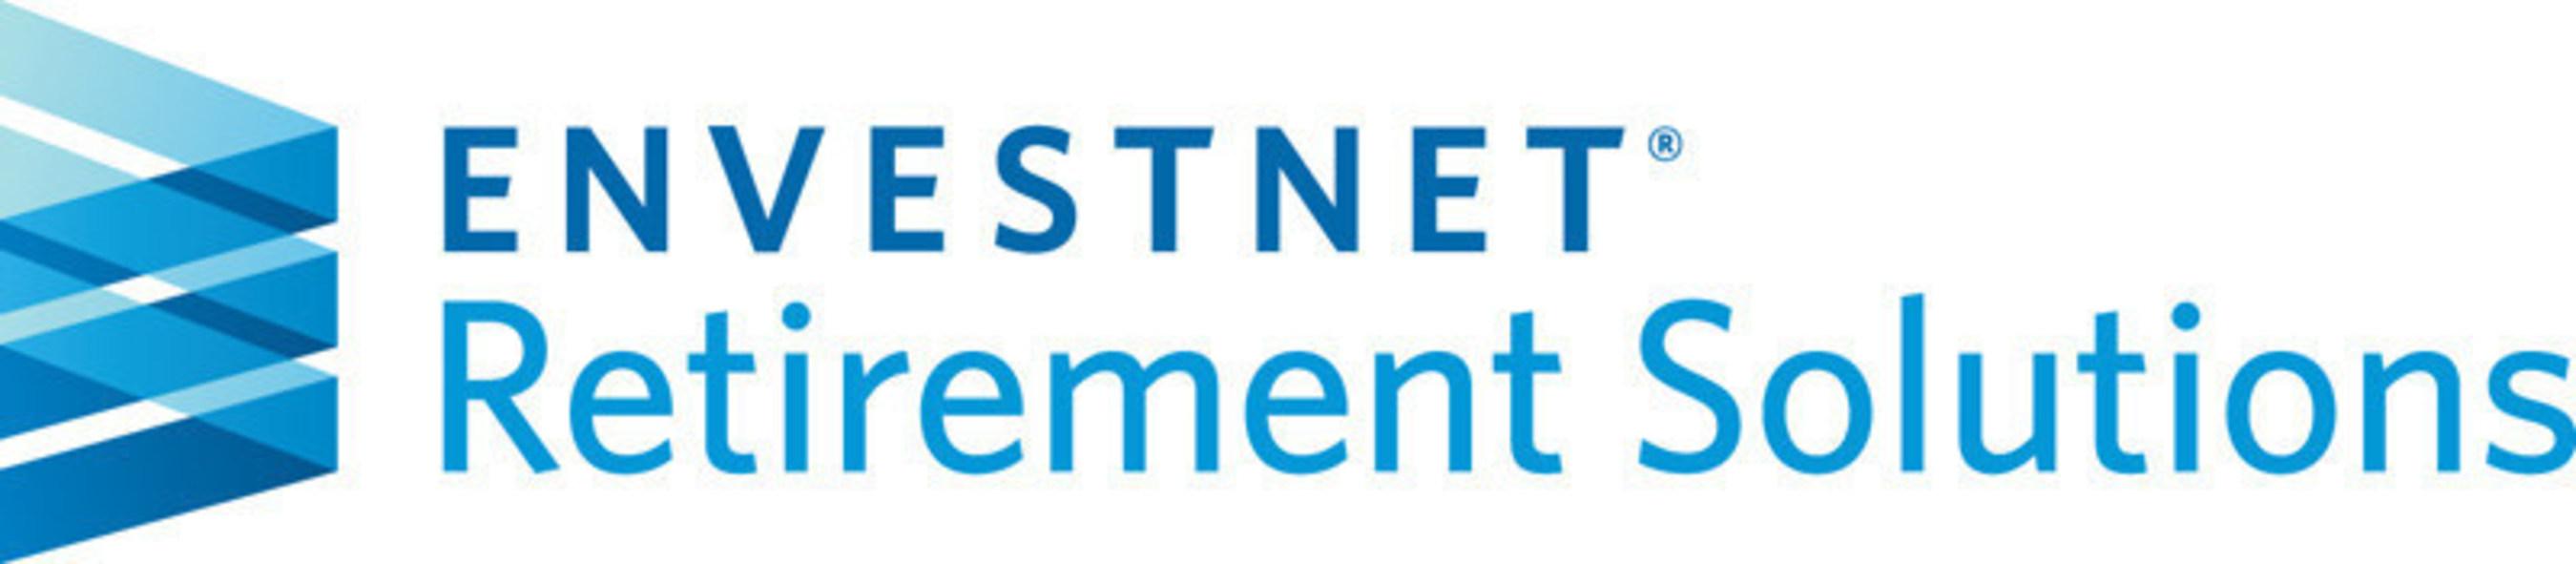 Envestnet | Retirement Solutions (ERS), a subsidiary of Envestnet, Inc., provides retirement advisors with an ...